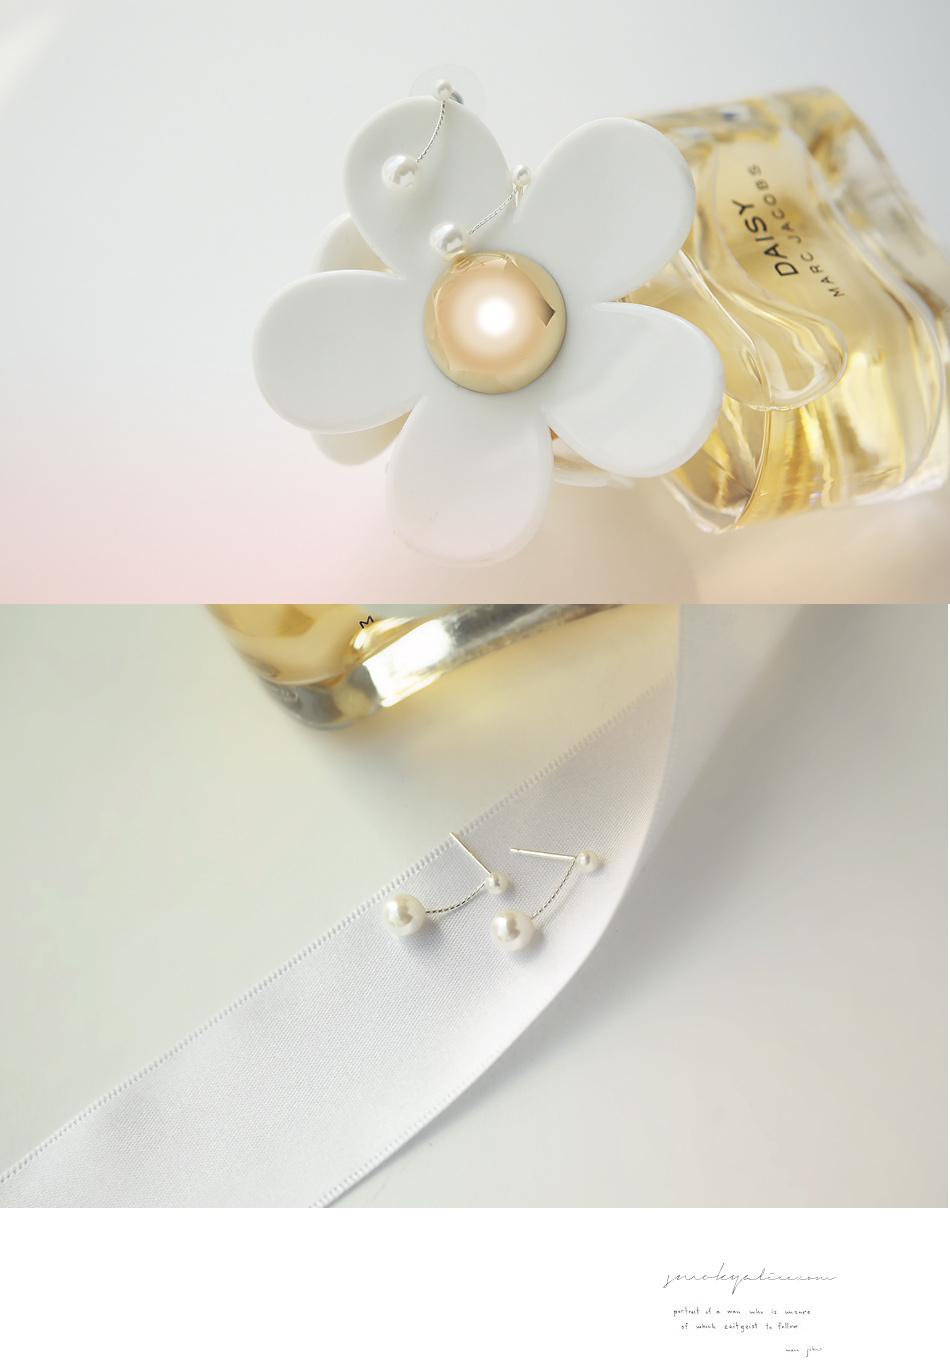 [ 4xtyle ] 纯双珍珠银耳环、一种颜色